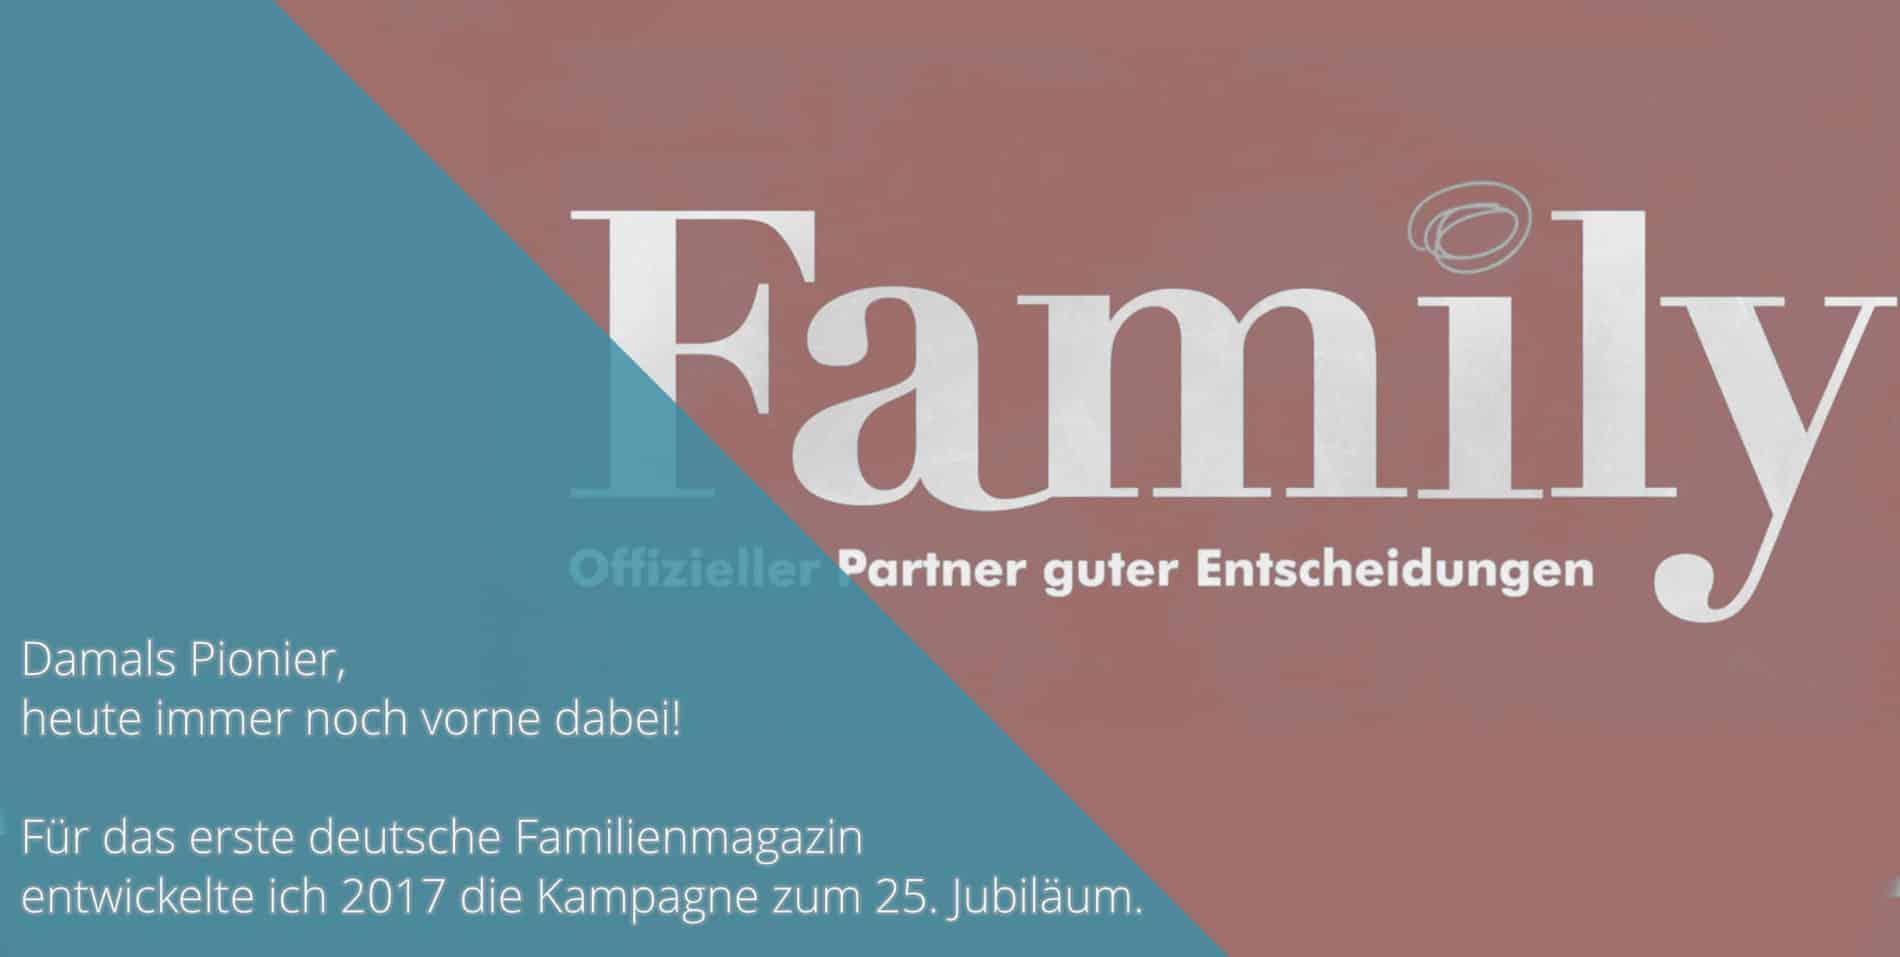 Family Jubiläum Arbeitsprobe Tim Allgaier Texter PR Freelancer Werbetexter köln